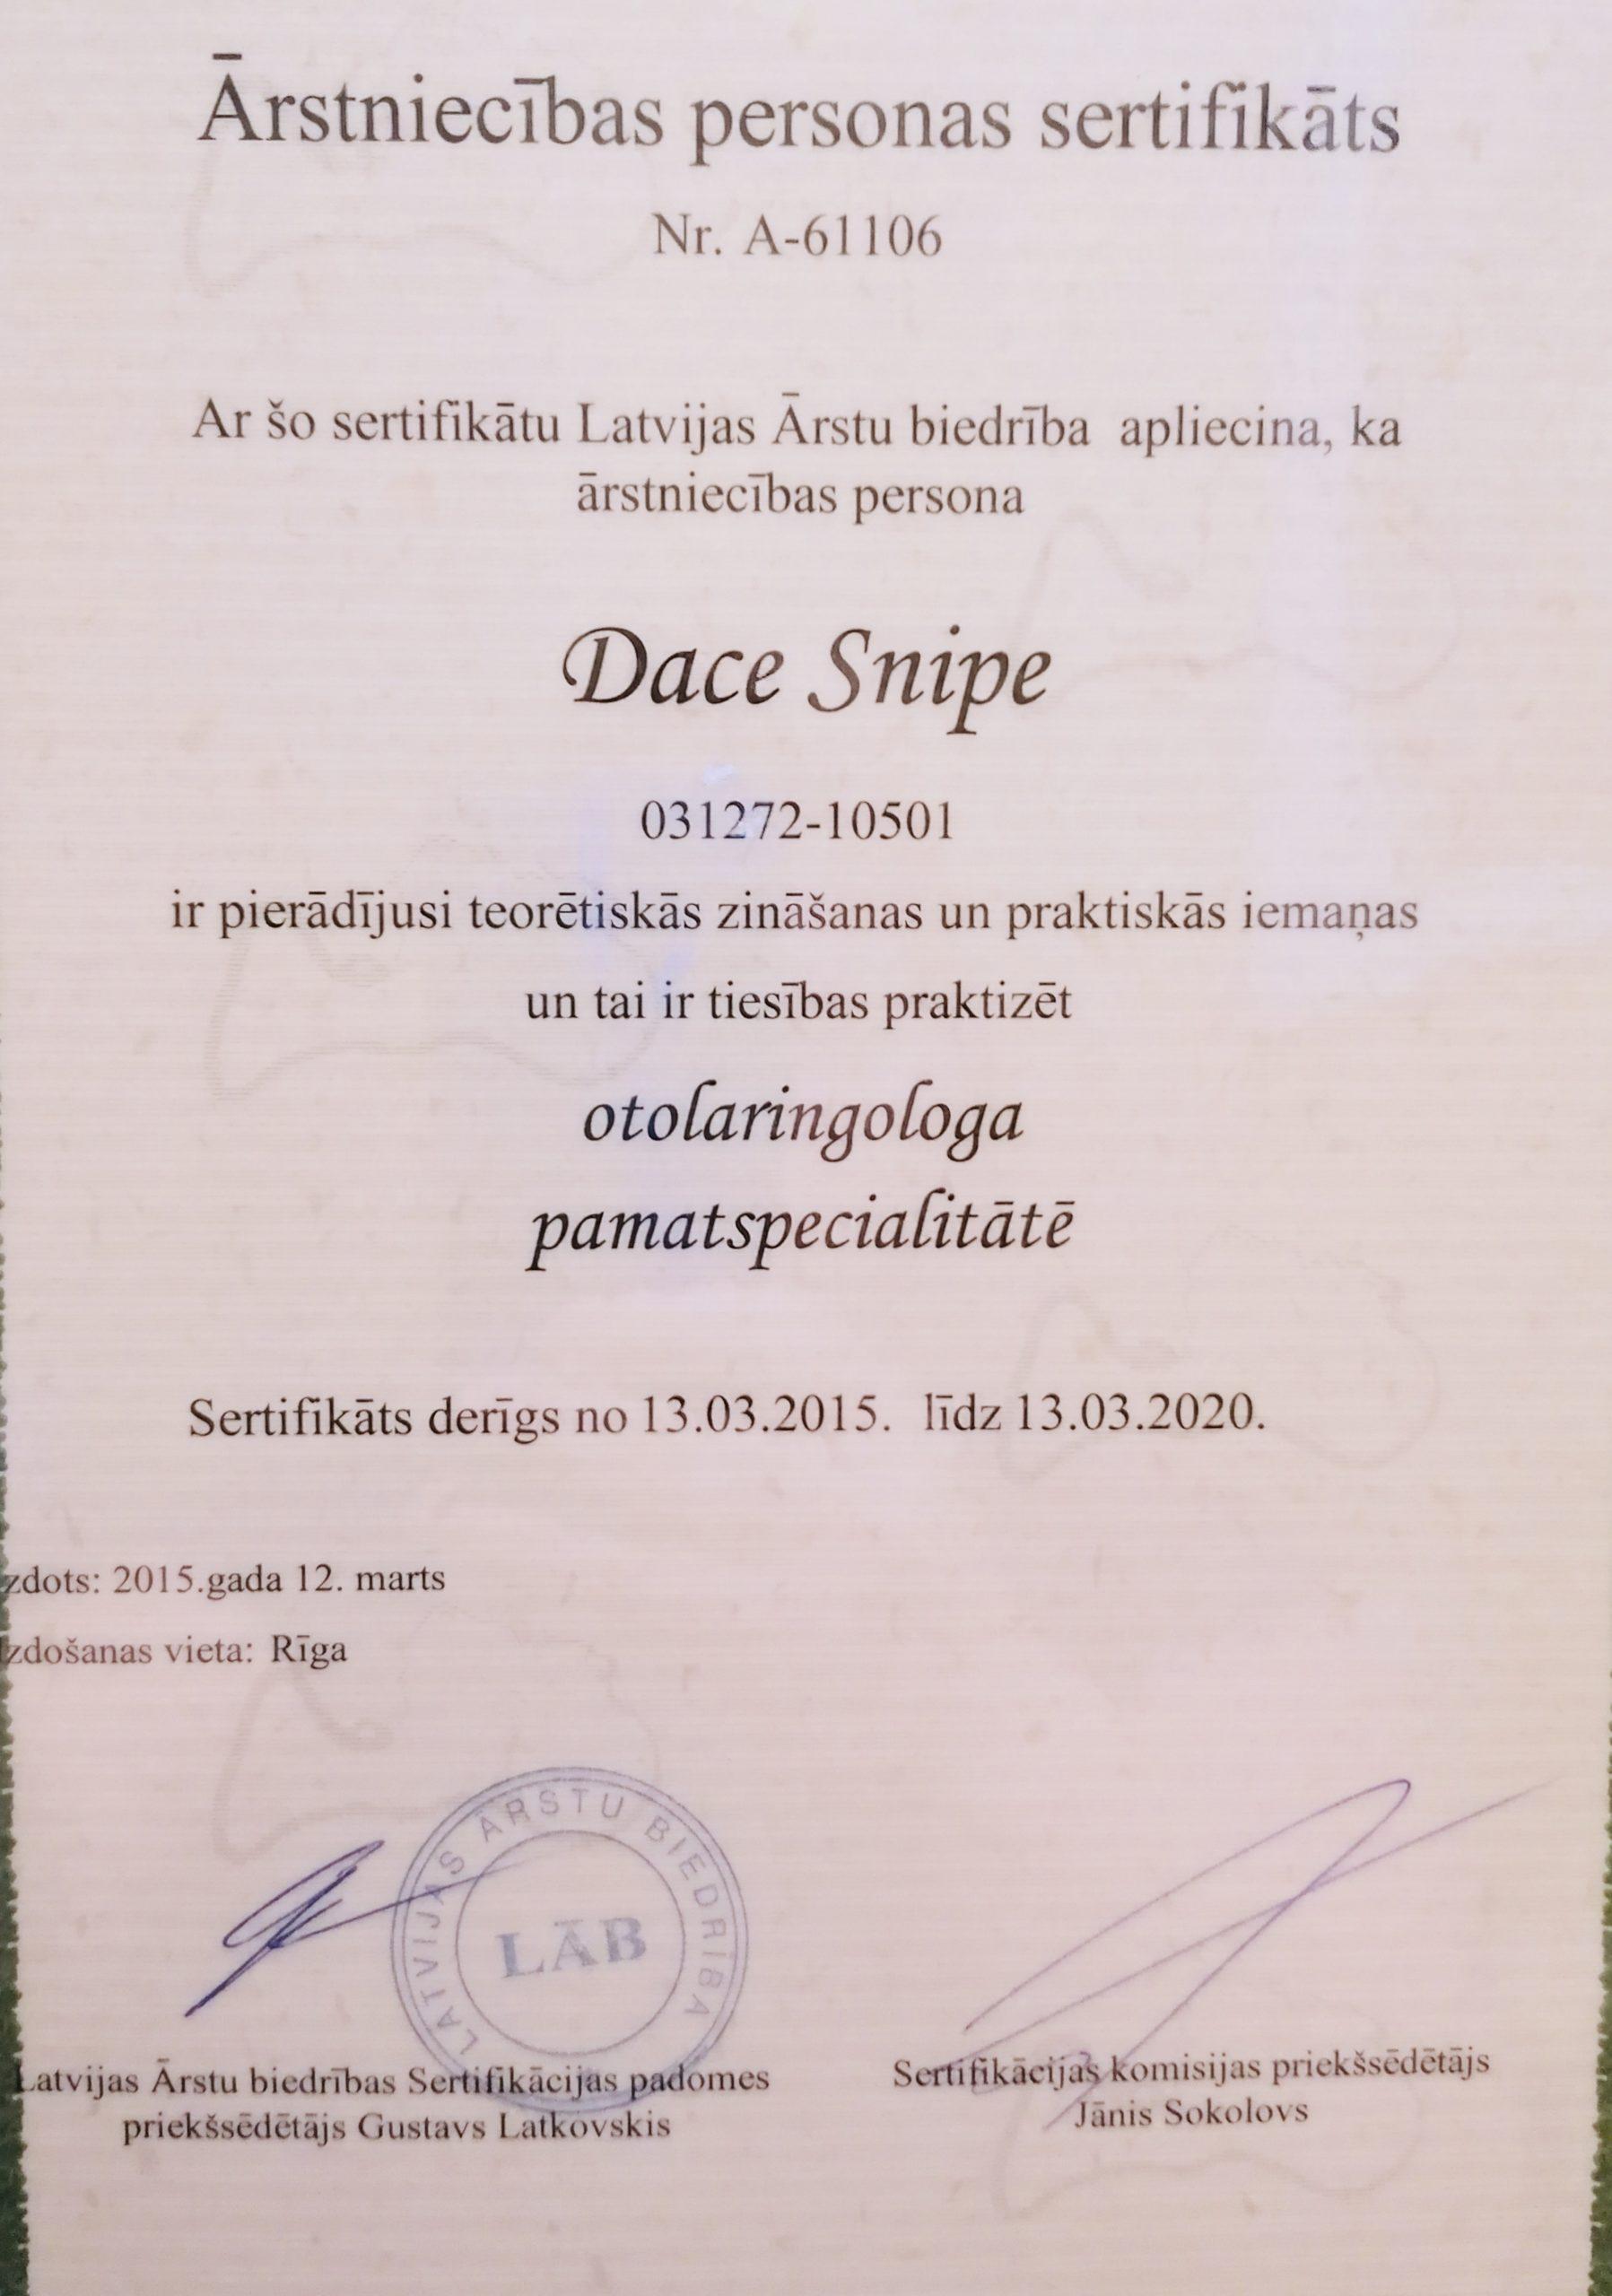 Sertifikāts - Dr. Snipe